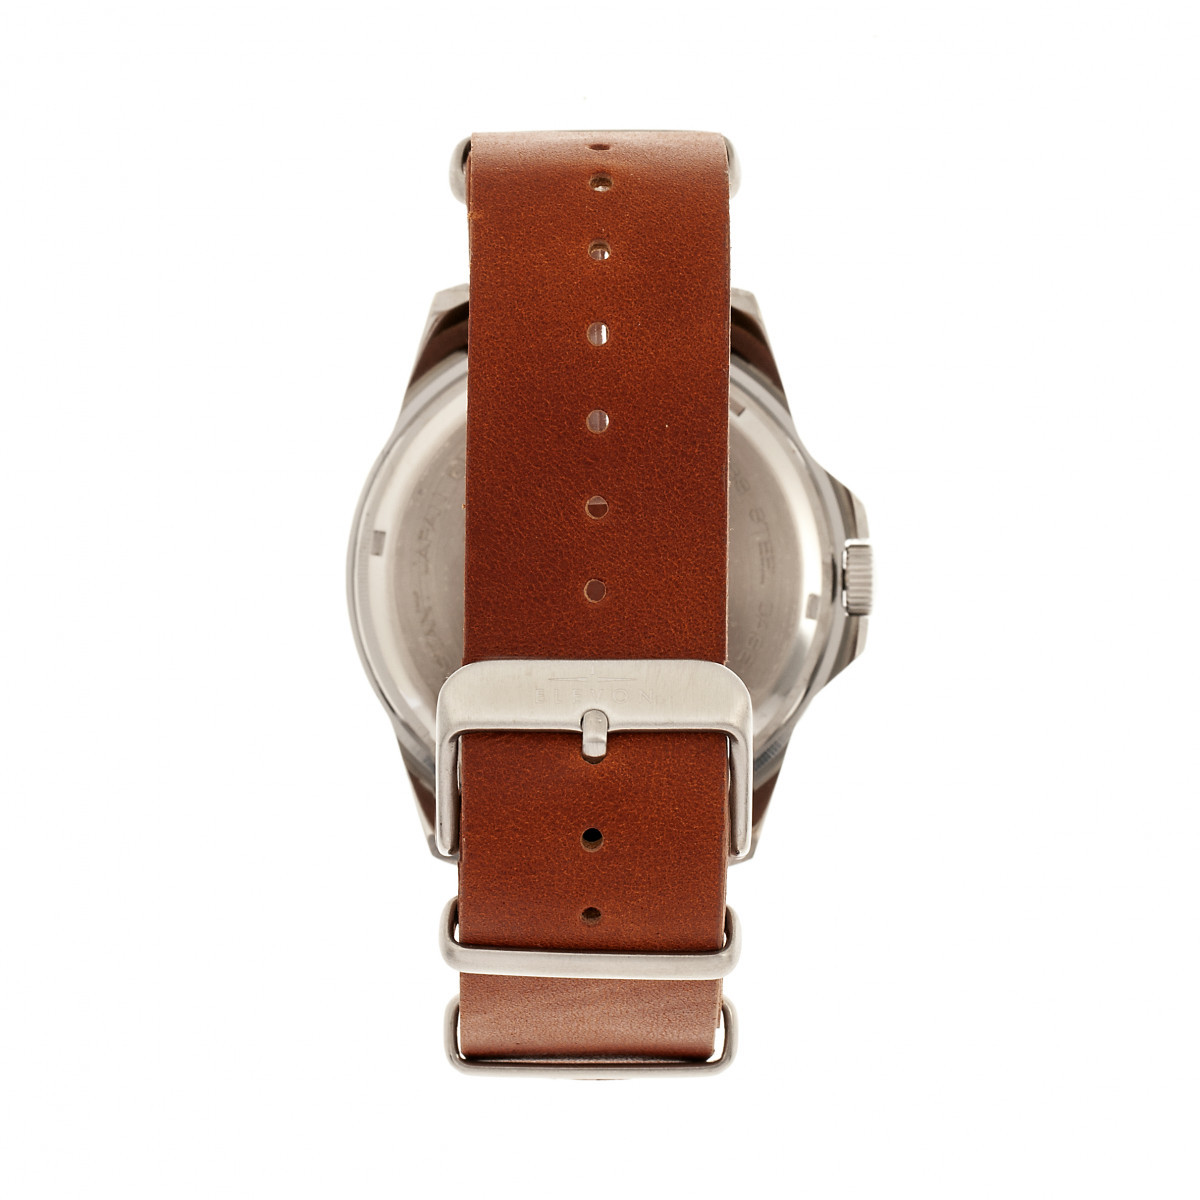 5dbbb5e9e Elevon Dumont Leather-Band Watch - Silver/Brown ELE108-2   Elevon ...